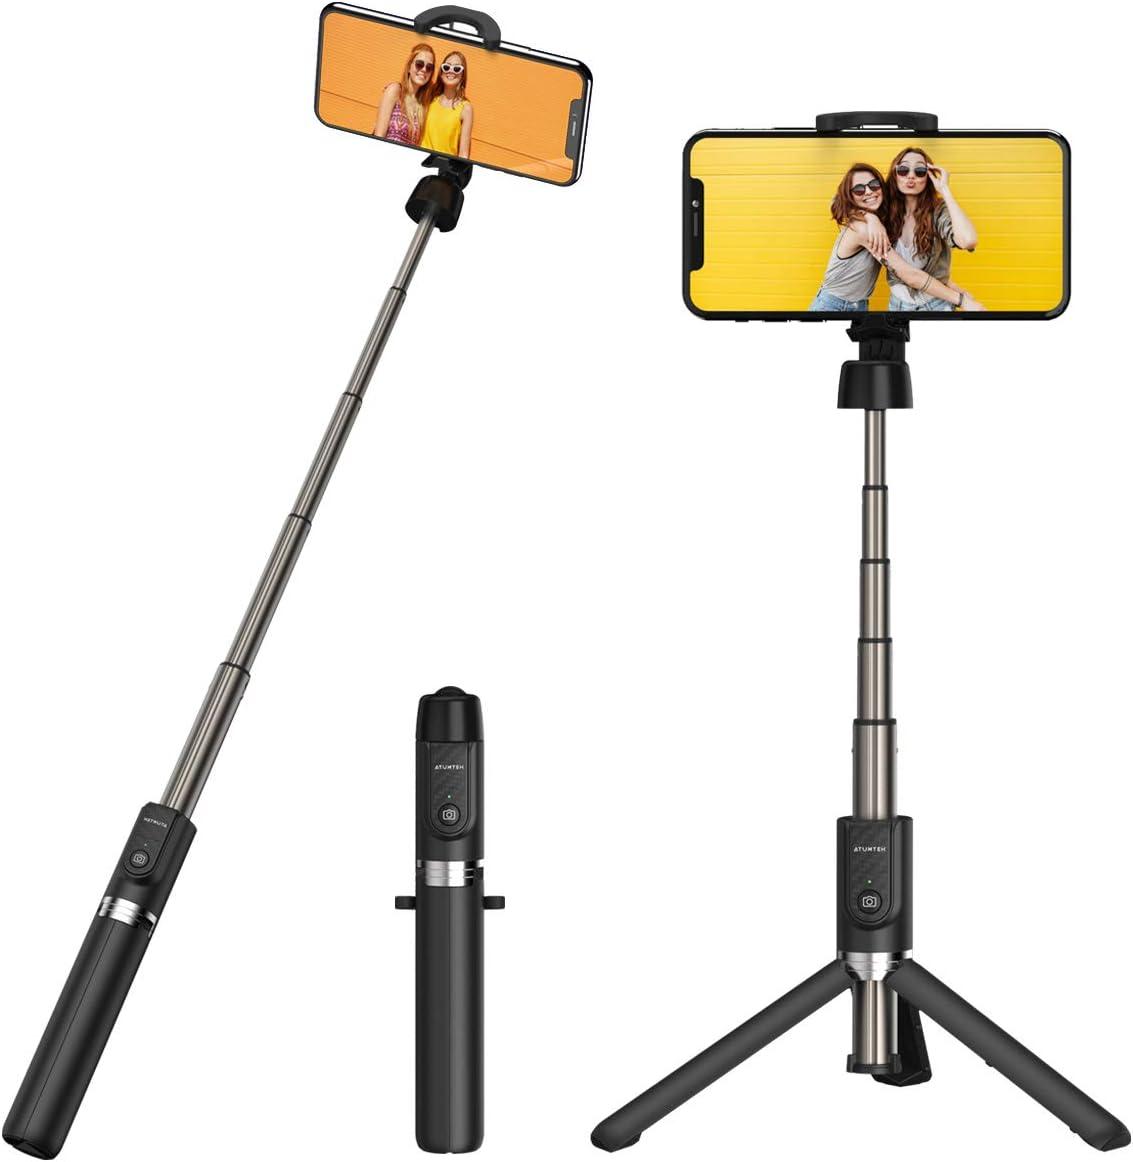 ATUMTEK Trípode Palo Selfie Bluetooth, Mini Palo para Selfies Extensible con Mando a Distancia Bluetooth Inalámbrico para iPhone XS MAX/XR/XS/X, iPhone 8/8 Plus, Samsung, Xiaomi, Huawei y Más